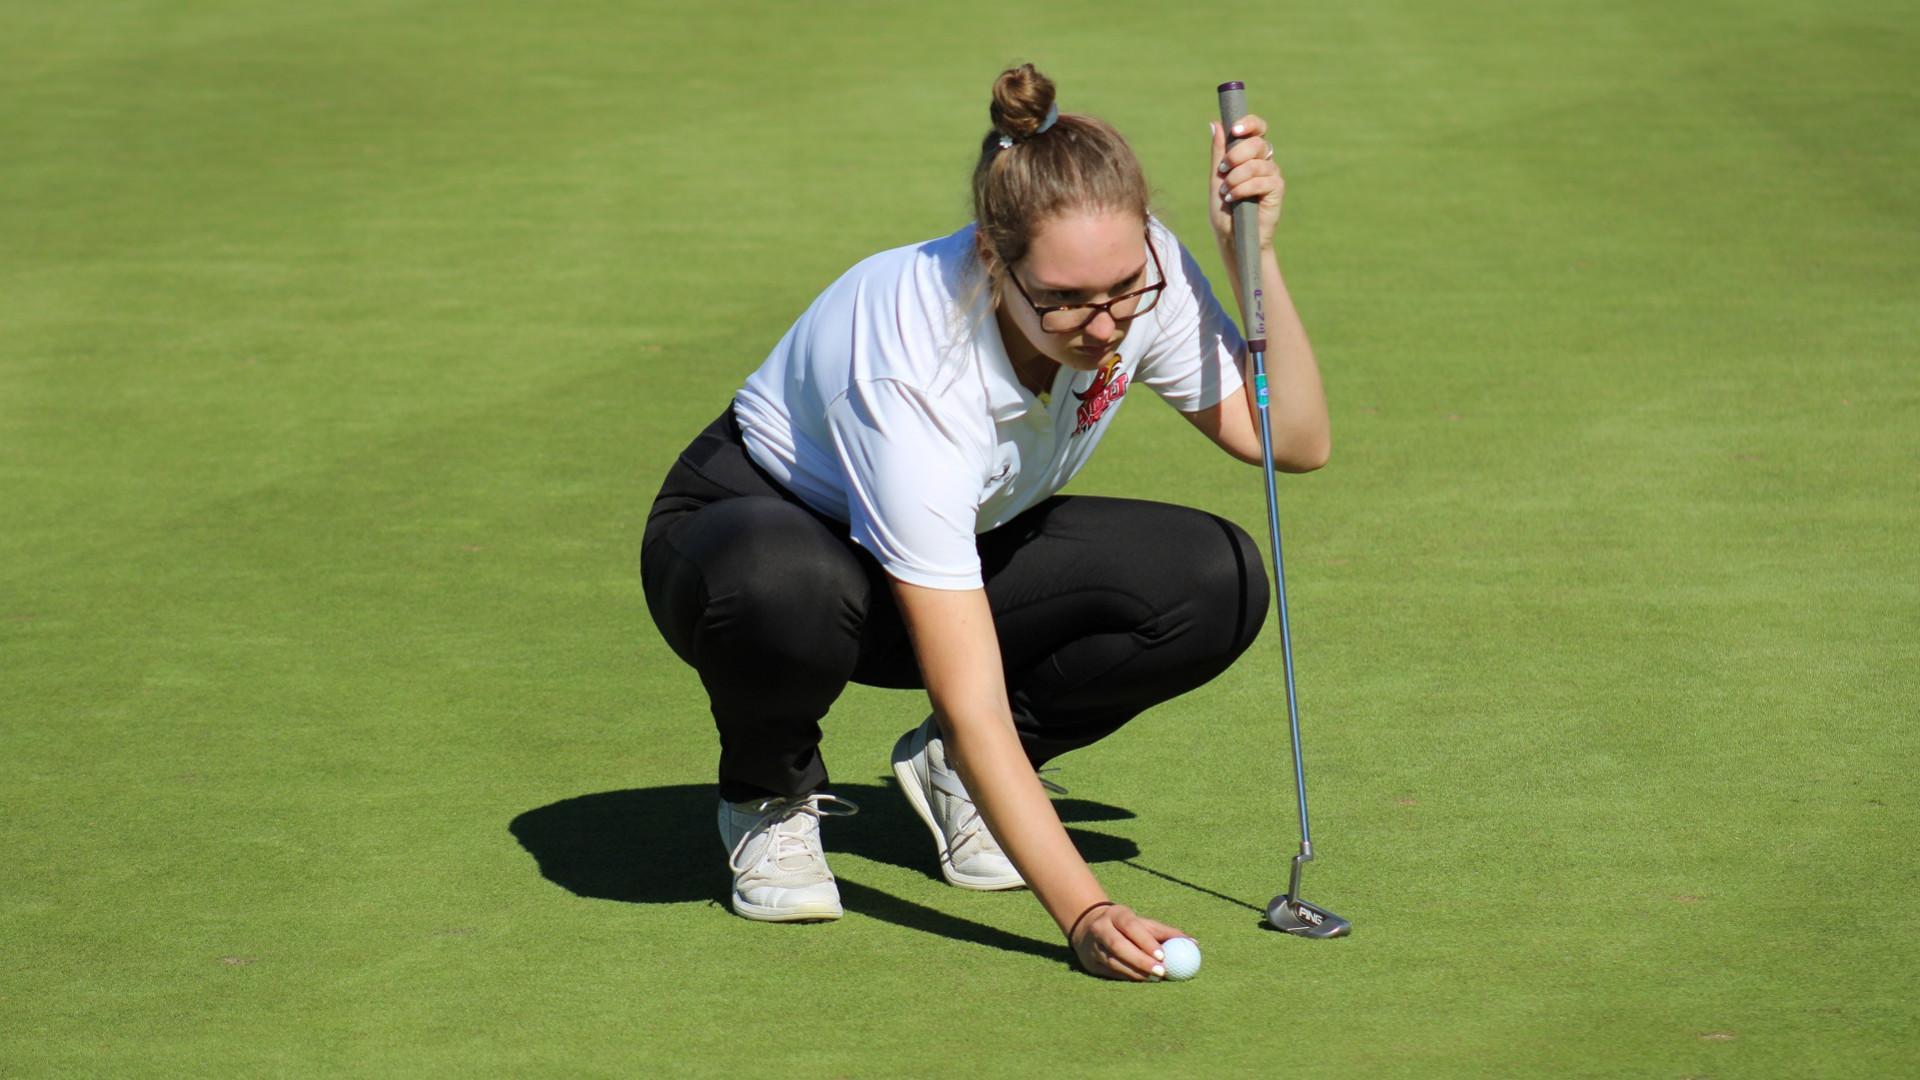 Guevara Leads Women's Golf at Eagle Invitational | Arizona Christian  University Athletics